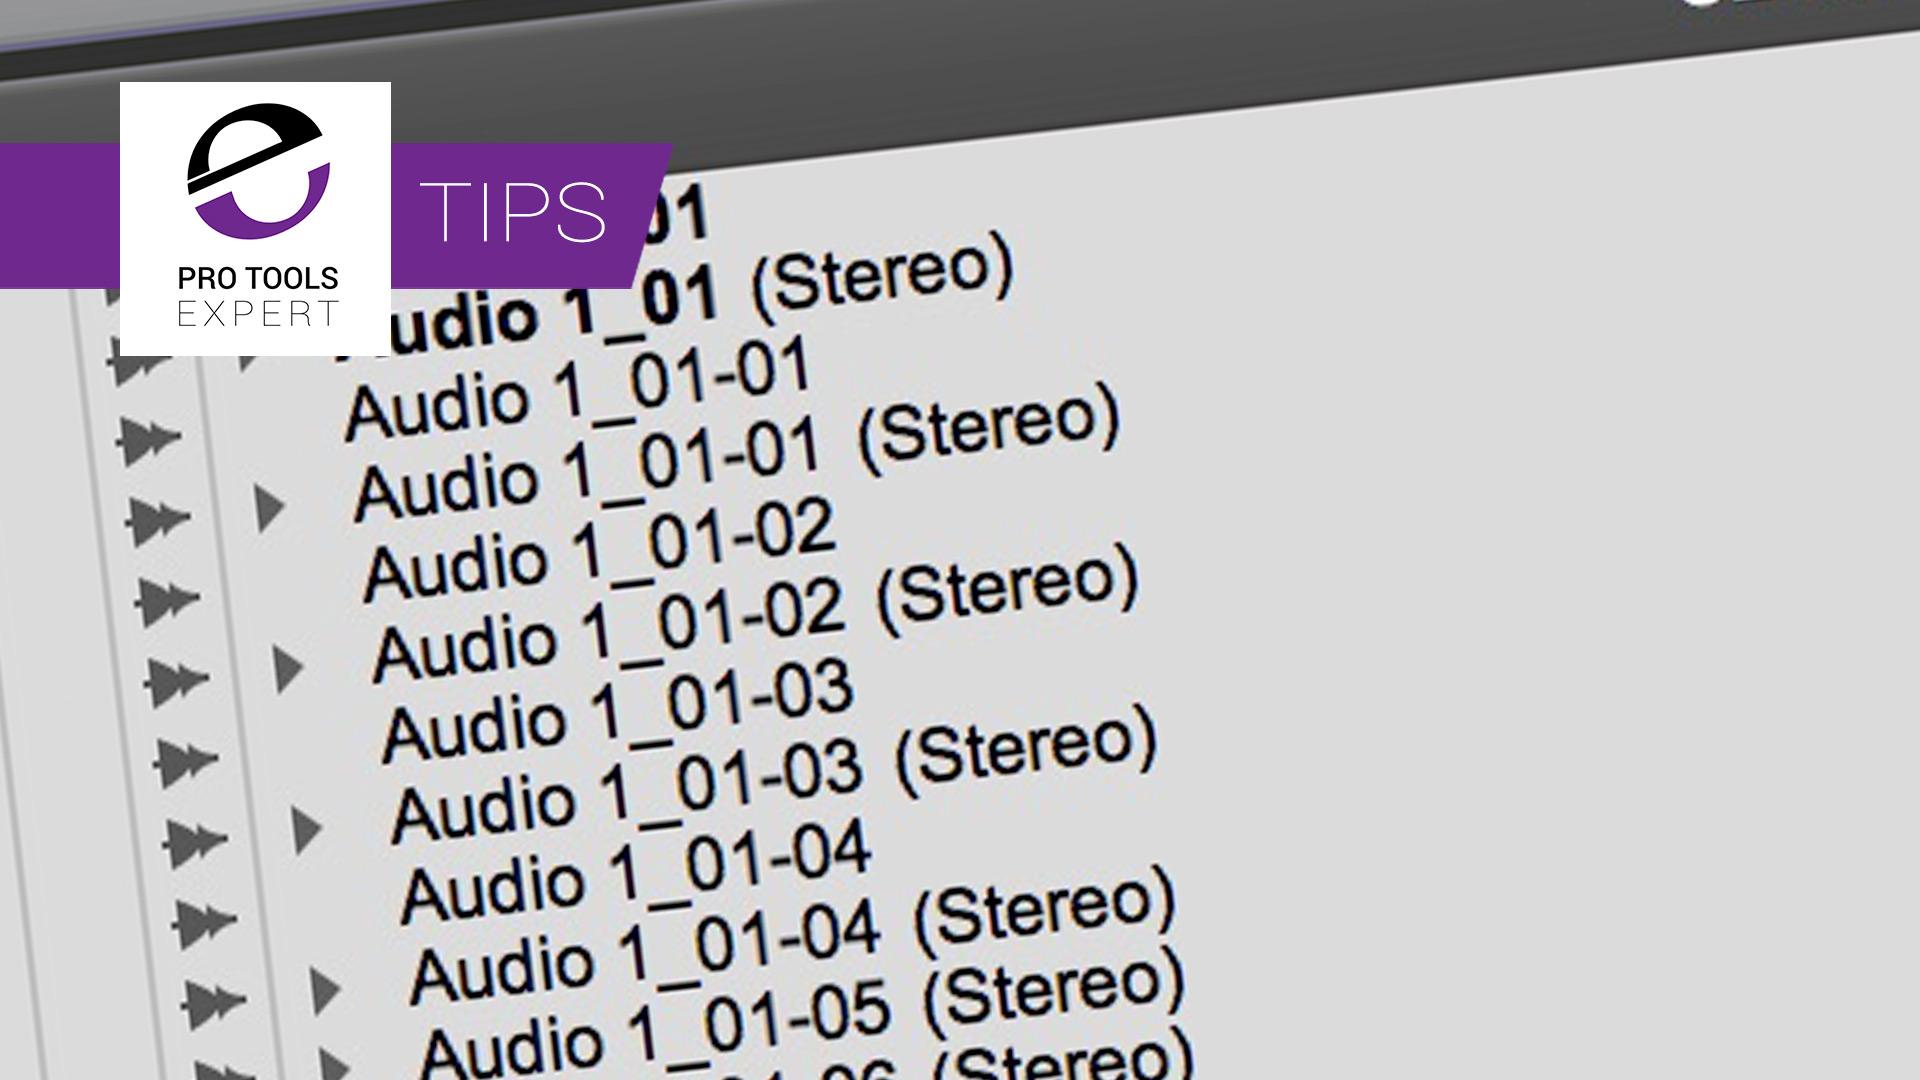 Pro-Tools-Tips.jpg